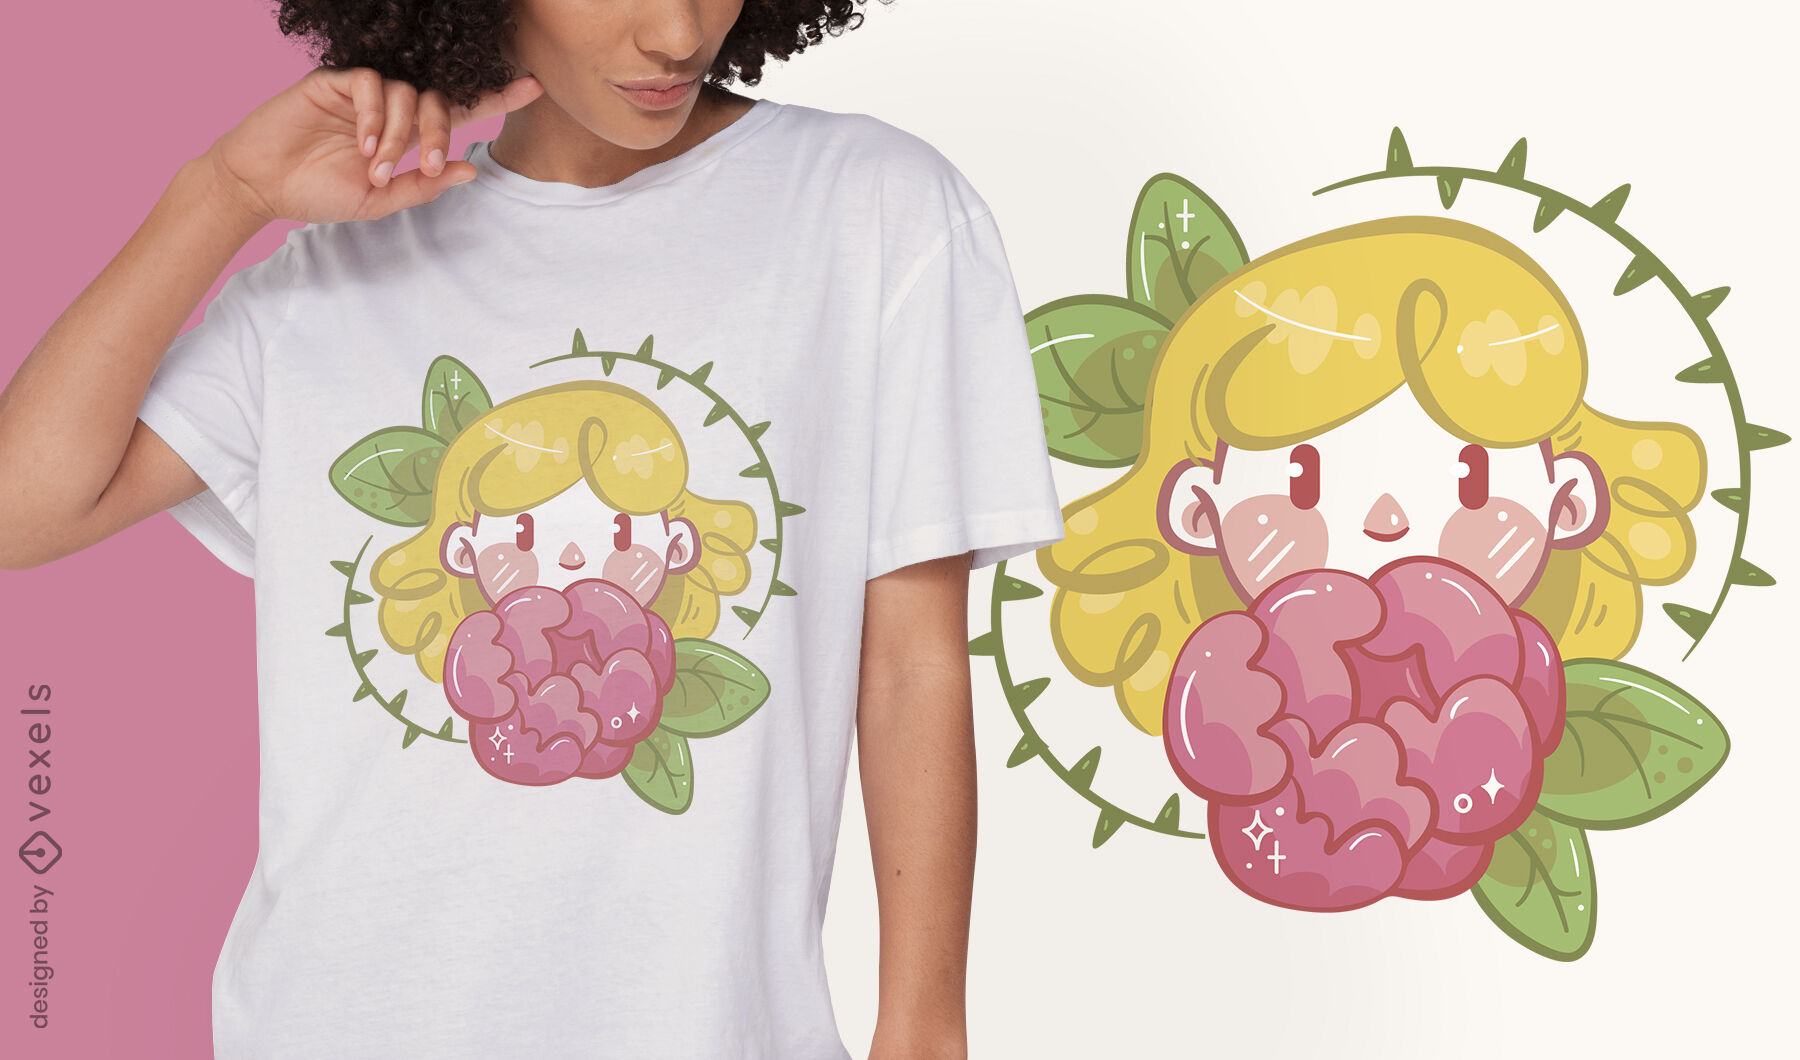 Chica con diseño de camiseta de flores.